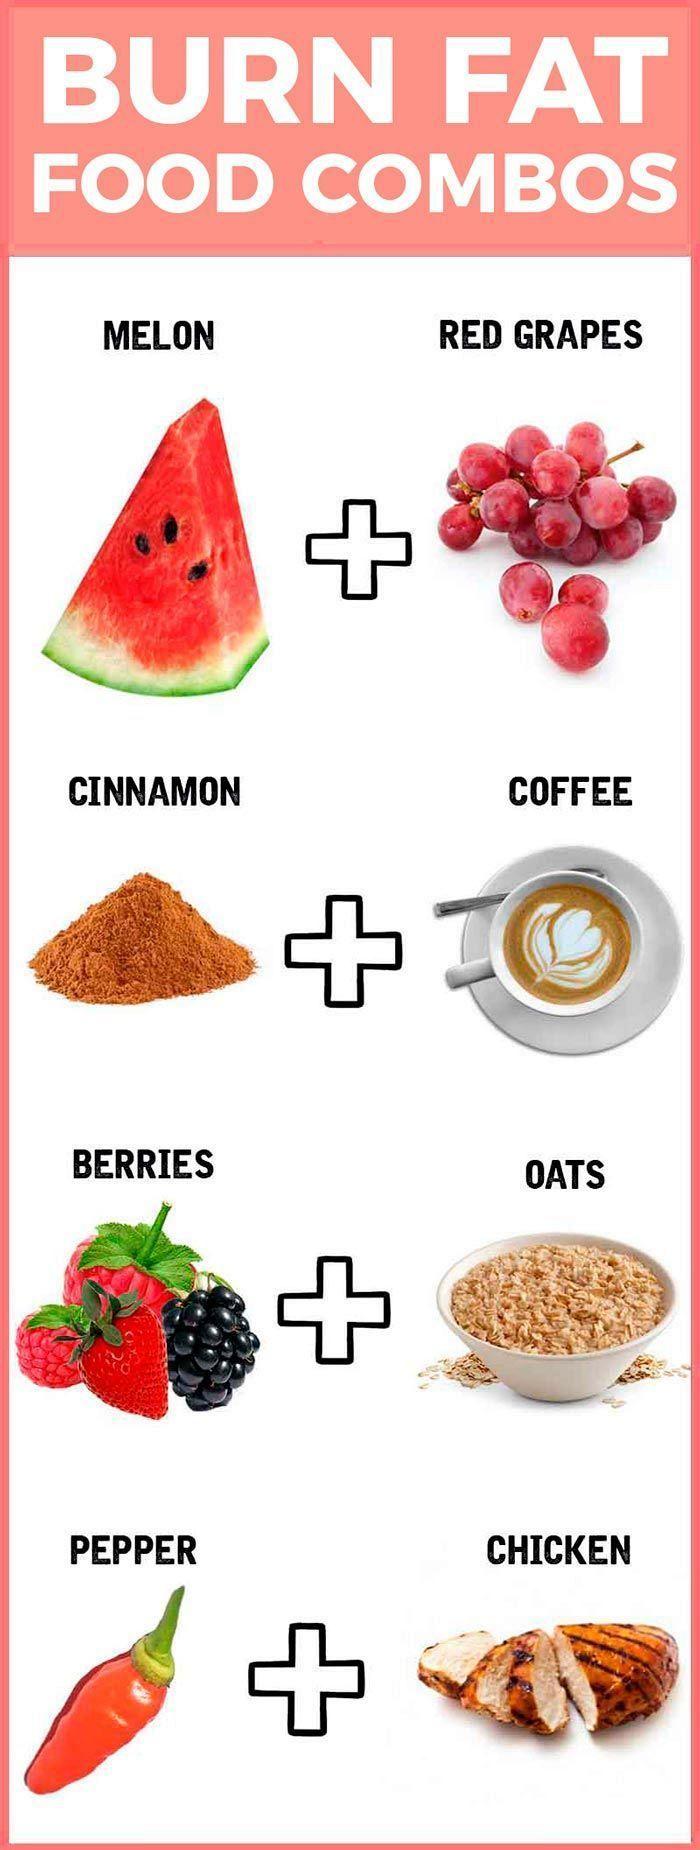 Best fat-burning foods. Burn fat food combinations